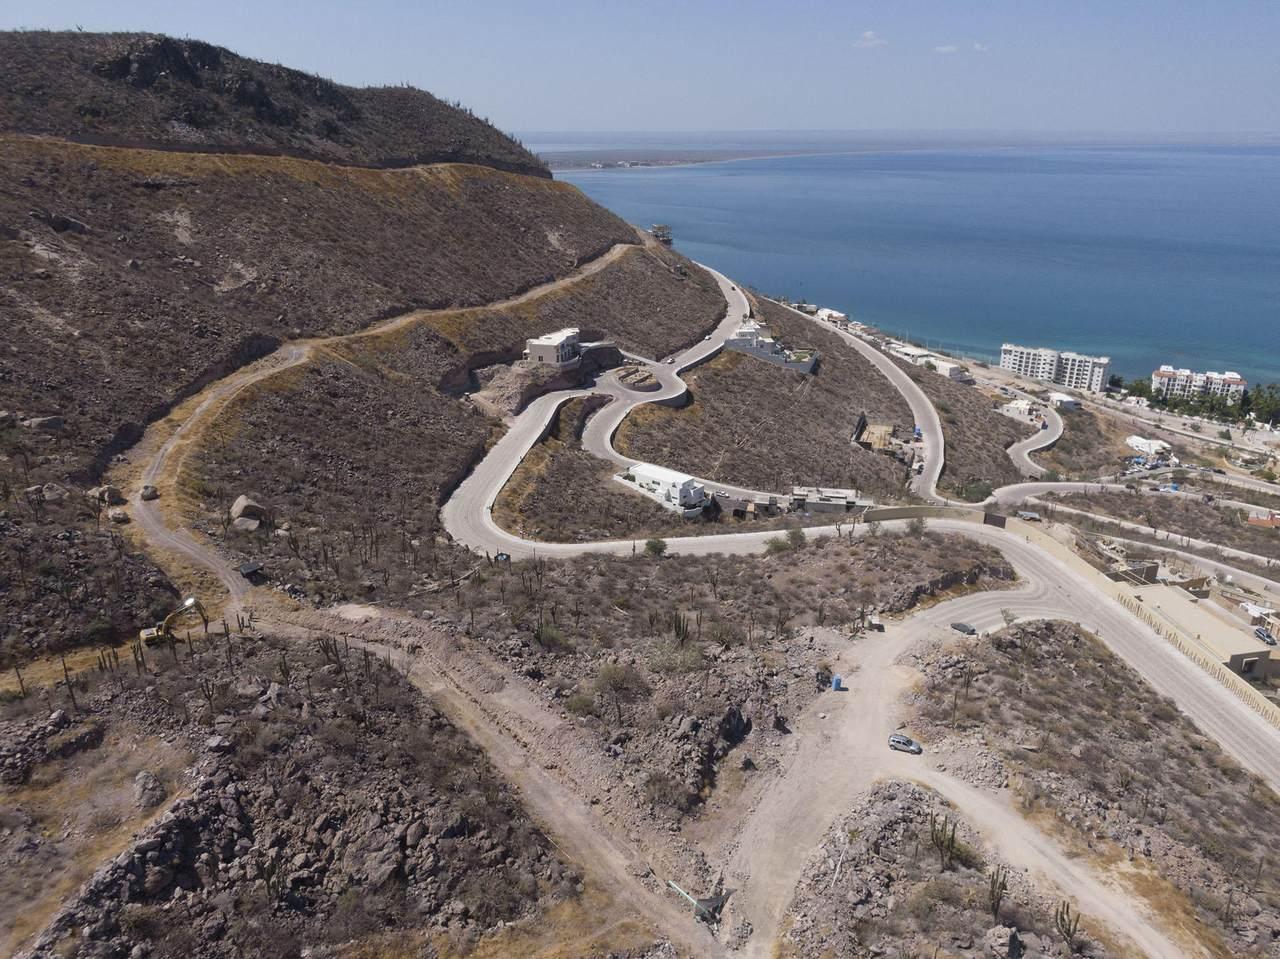 Camino De La Grava Pedregal La Paz - Photo 1